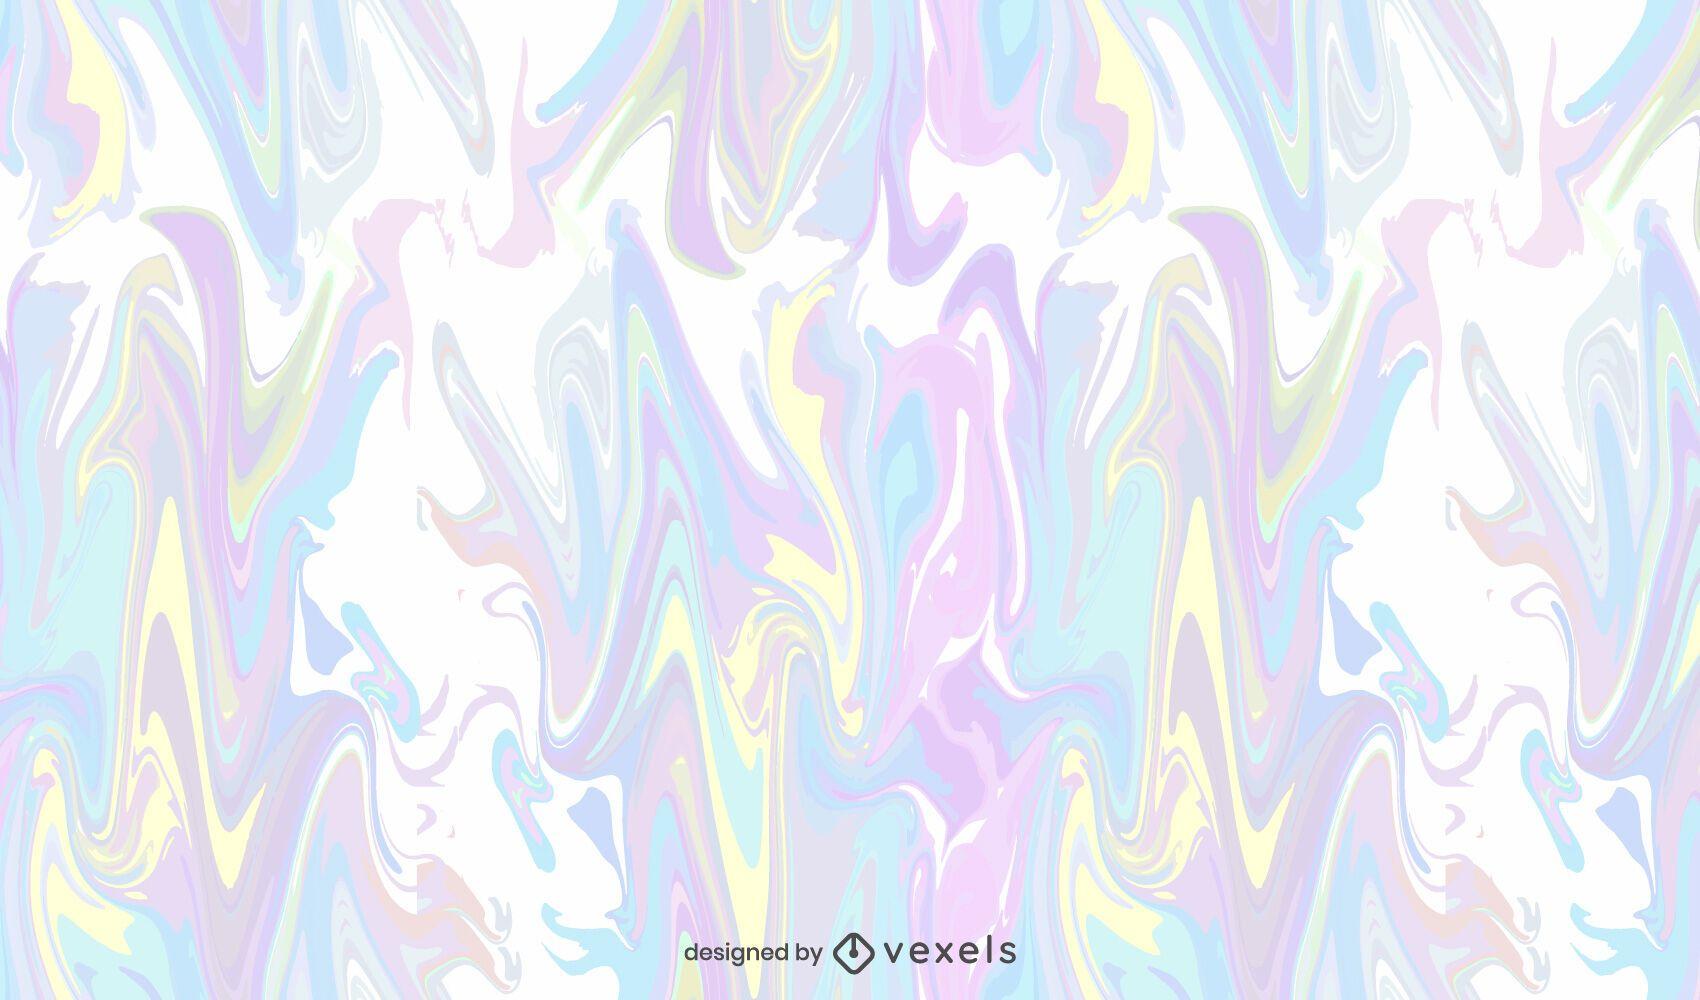 Pastel tie-dye pattern design